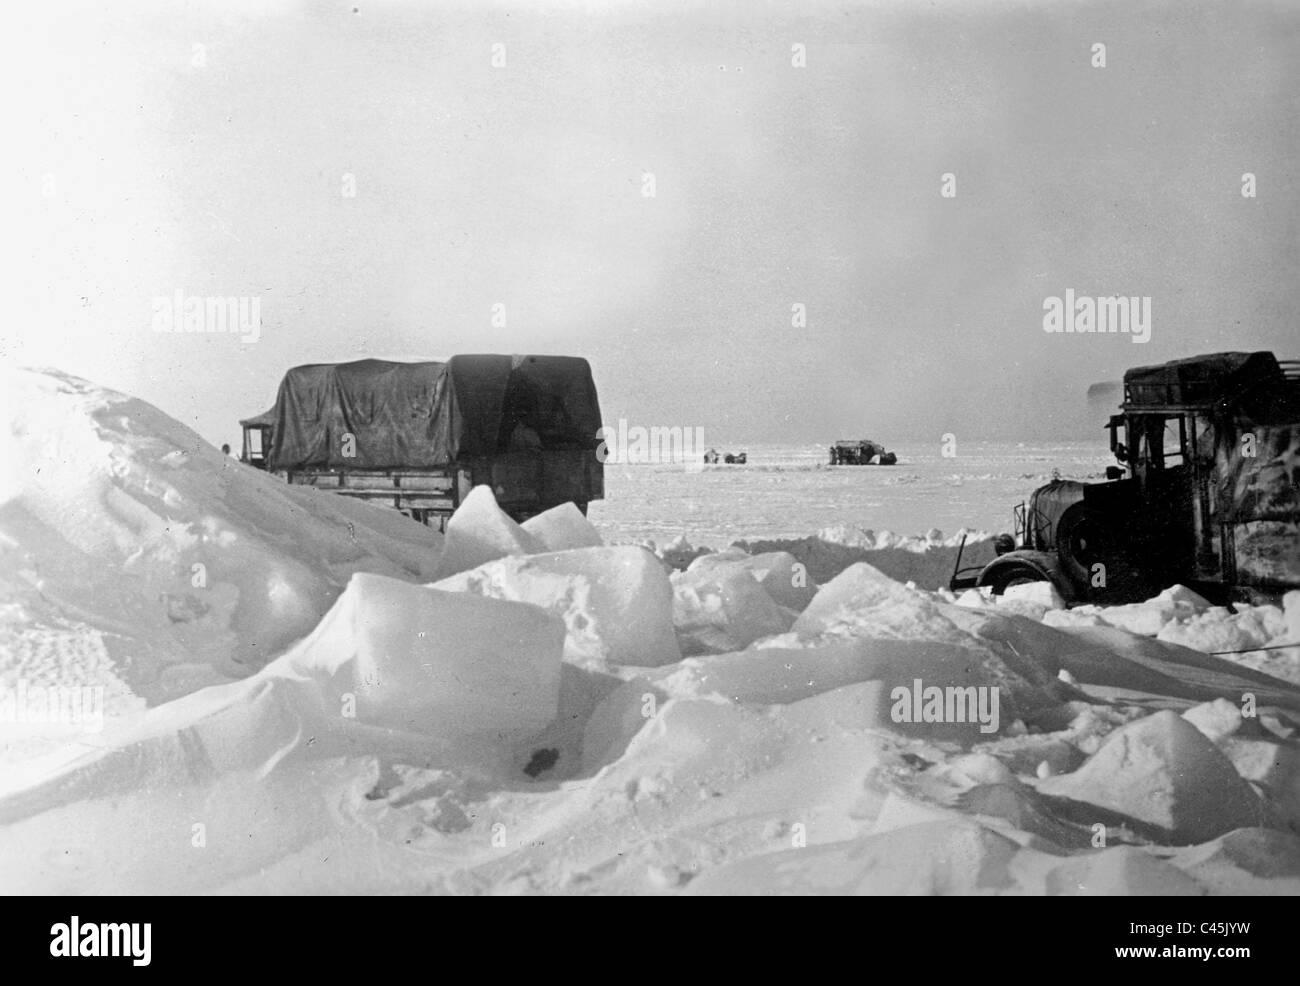 German military transport on the way to the Finnish island of Tytarsaari, 1942 - Stock Image